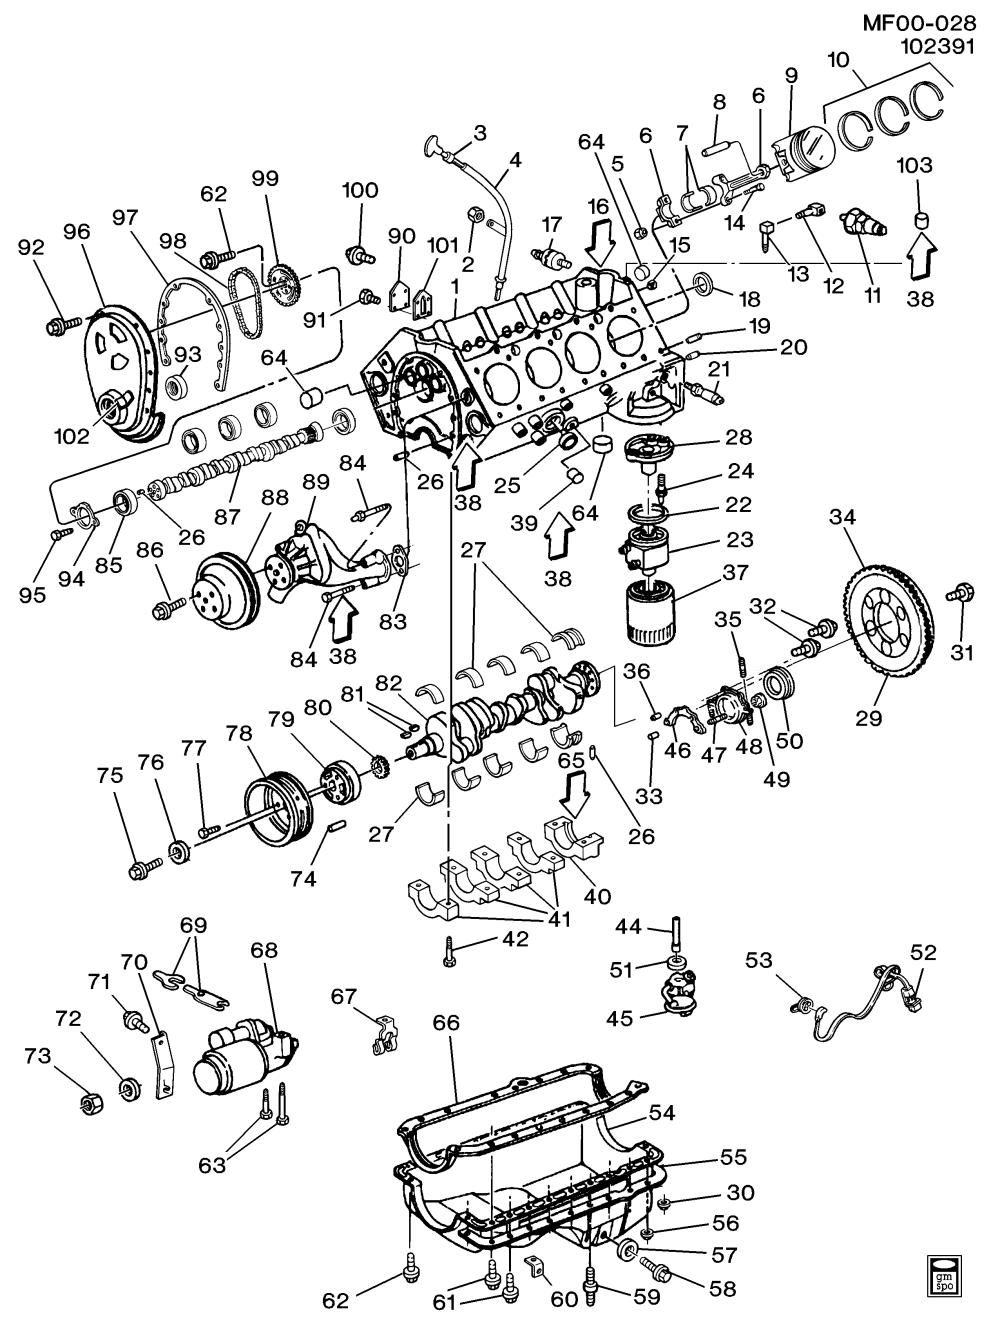 medium resolution of l98 engine diagram wiring diagram for you l98 engine diagram wiring diagram expert l98 engine diagram